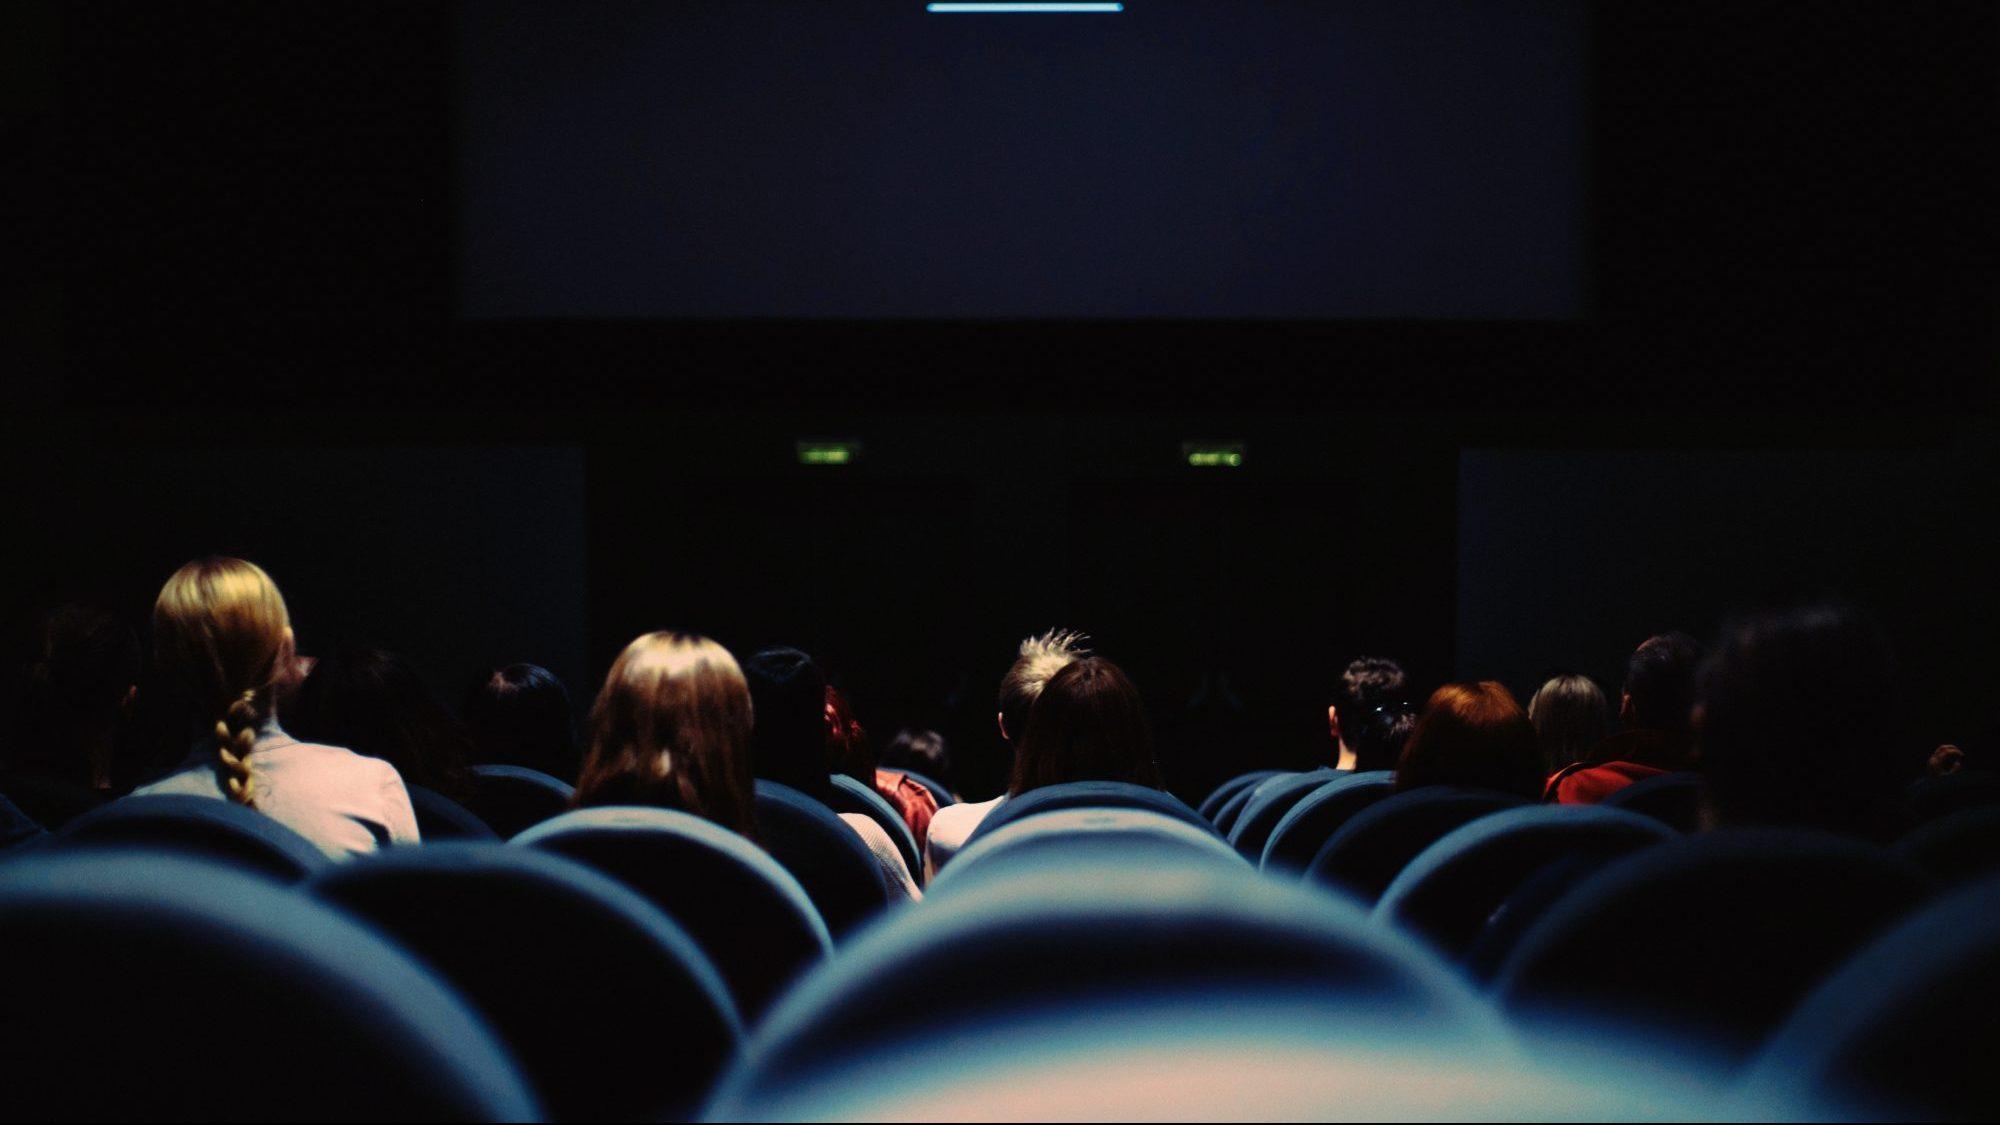 https://theatrefilm.ubc.ca/wp-content/uploads/sites/21/2021/09/VIFF-Banner-e1632851454816.jpeg